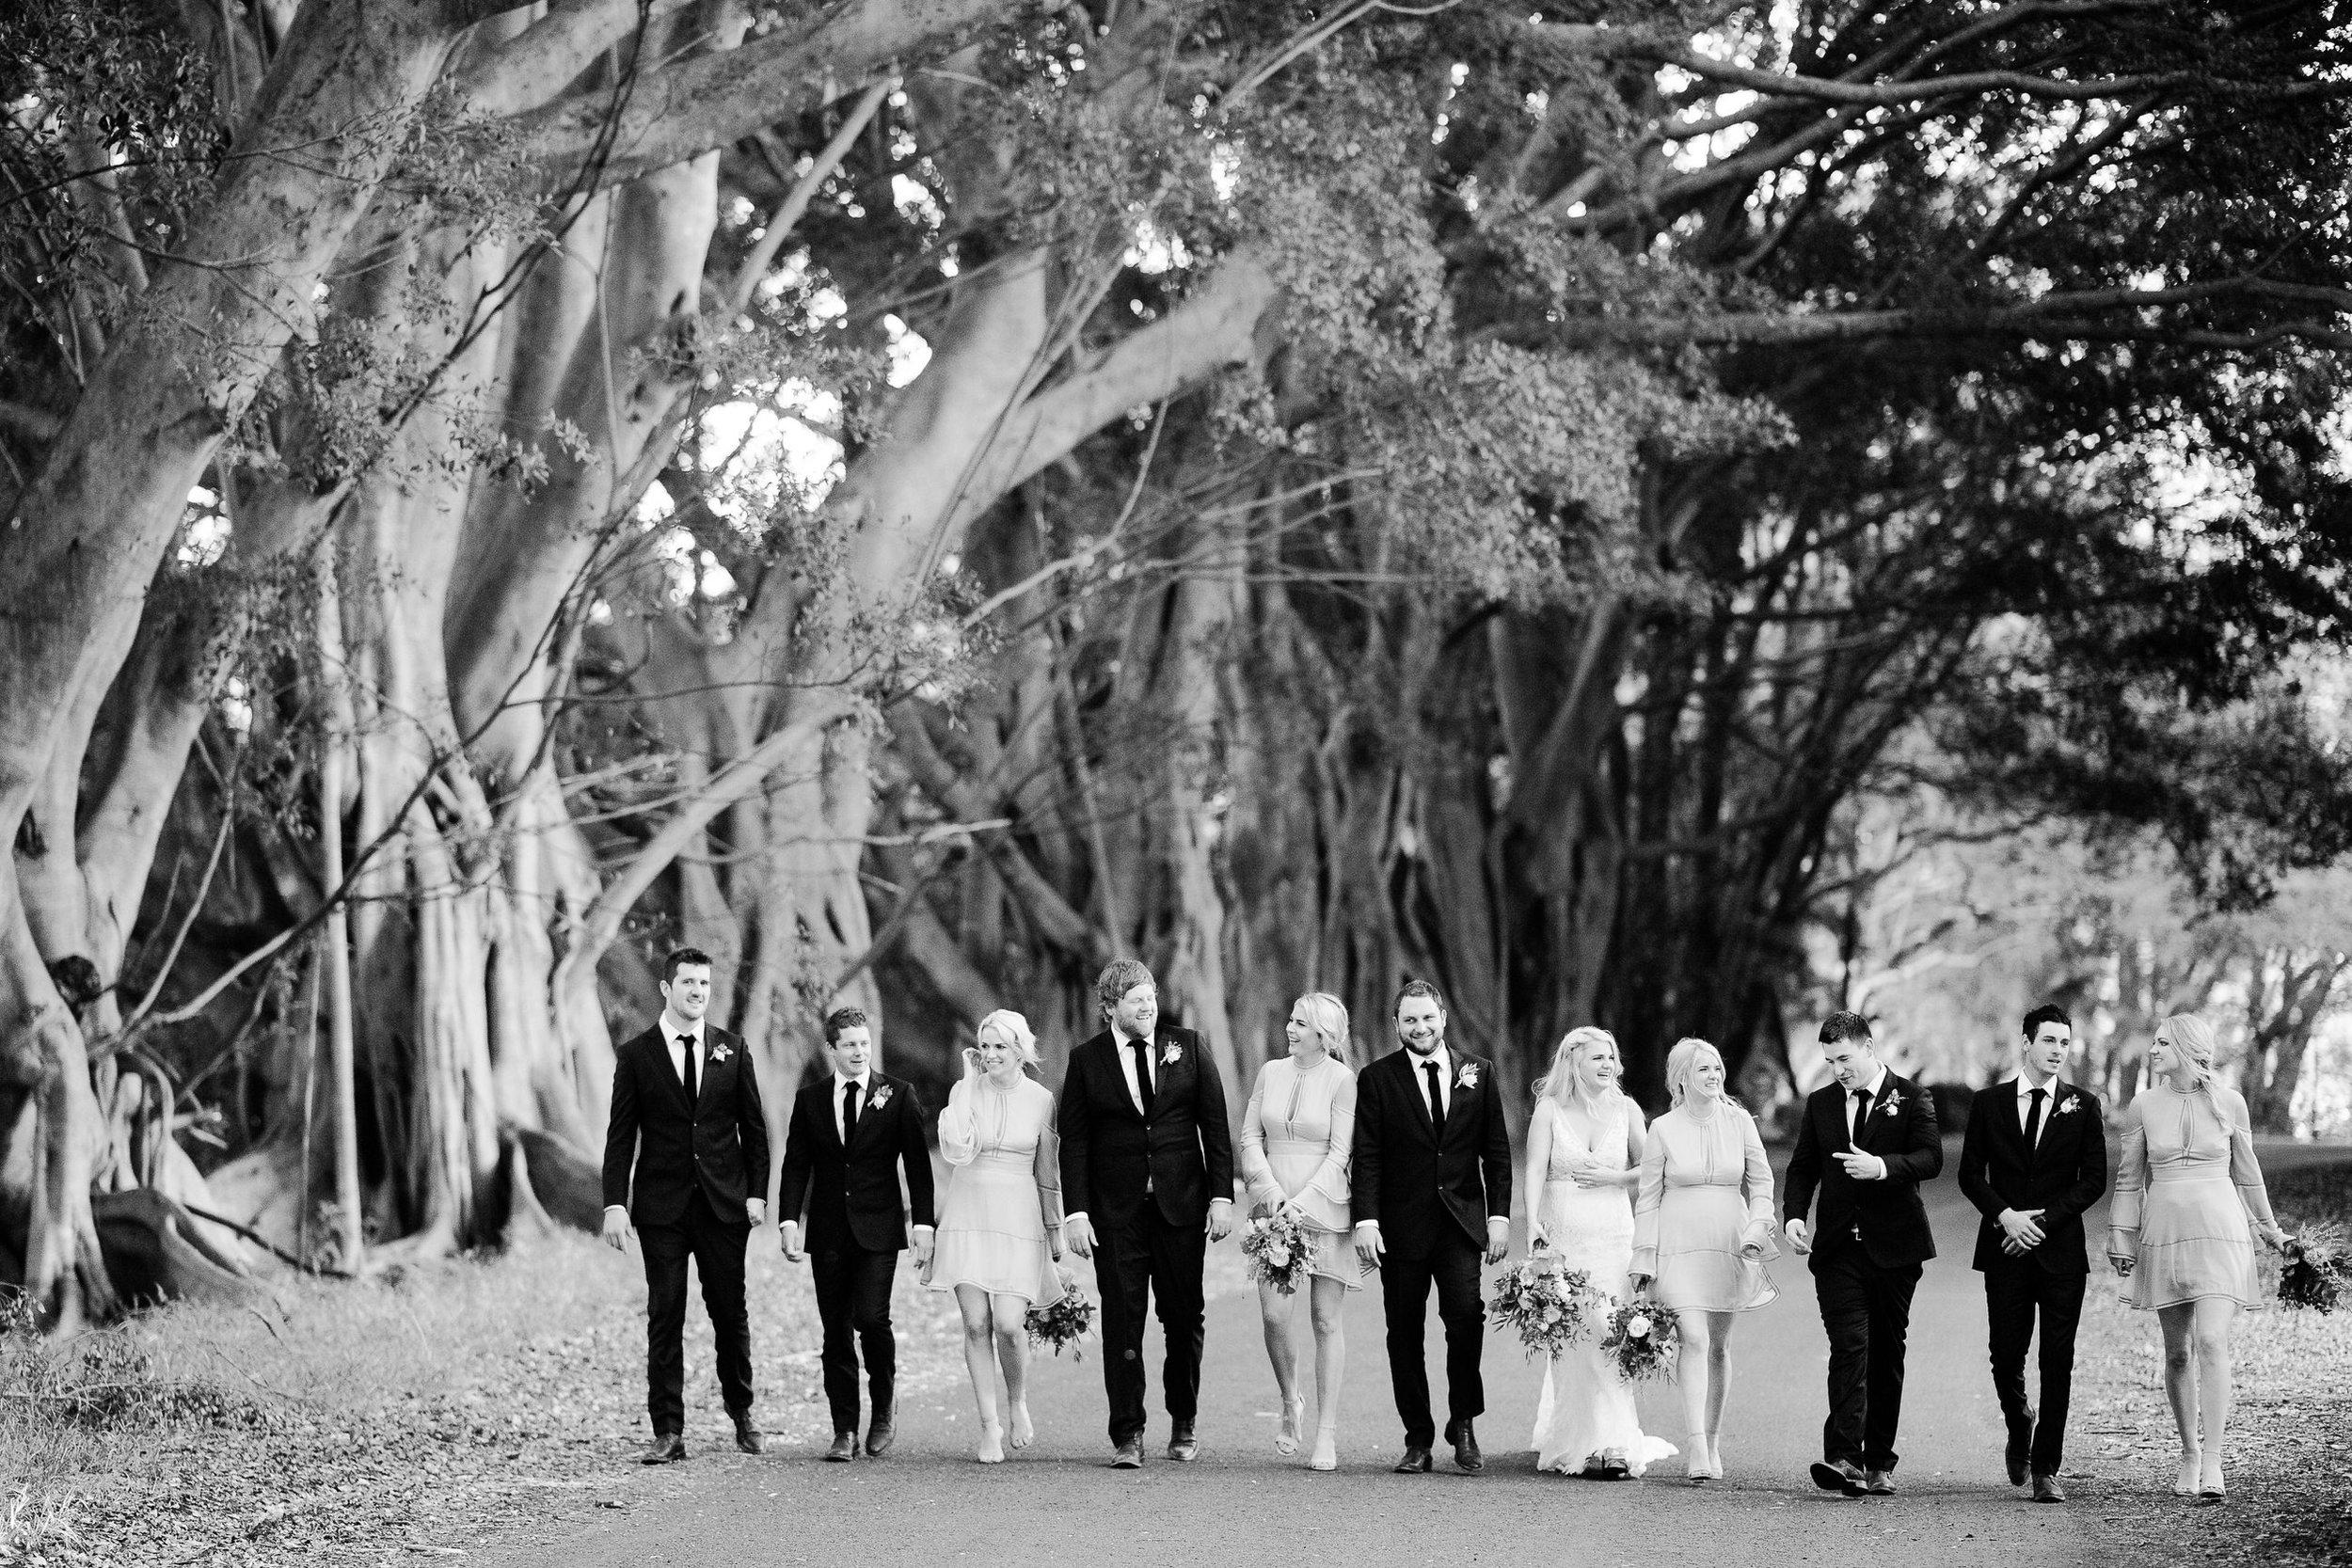 Justin_And_Jim_Photography_Byron_Bay_Wedding077.JPG